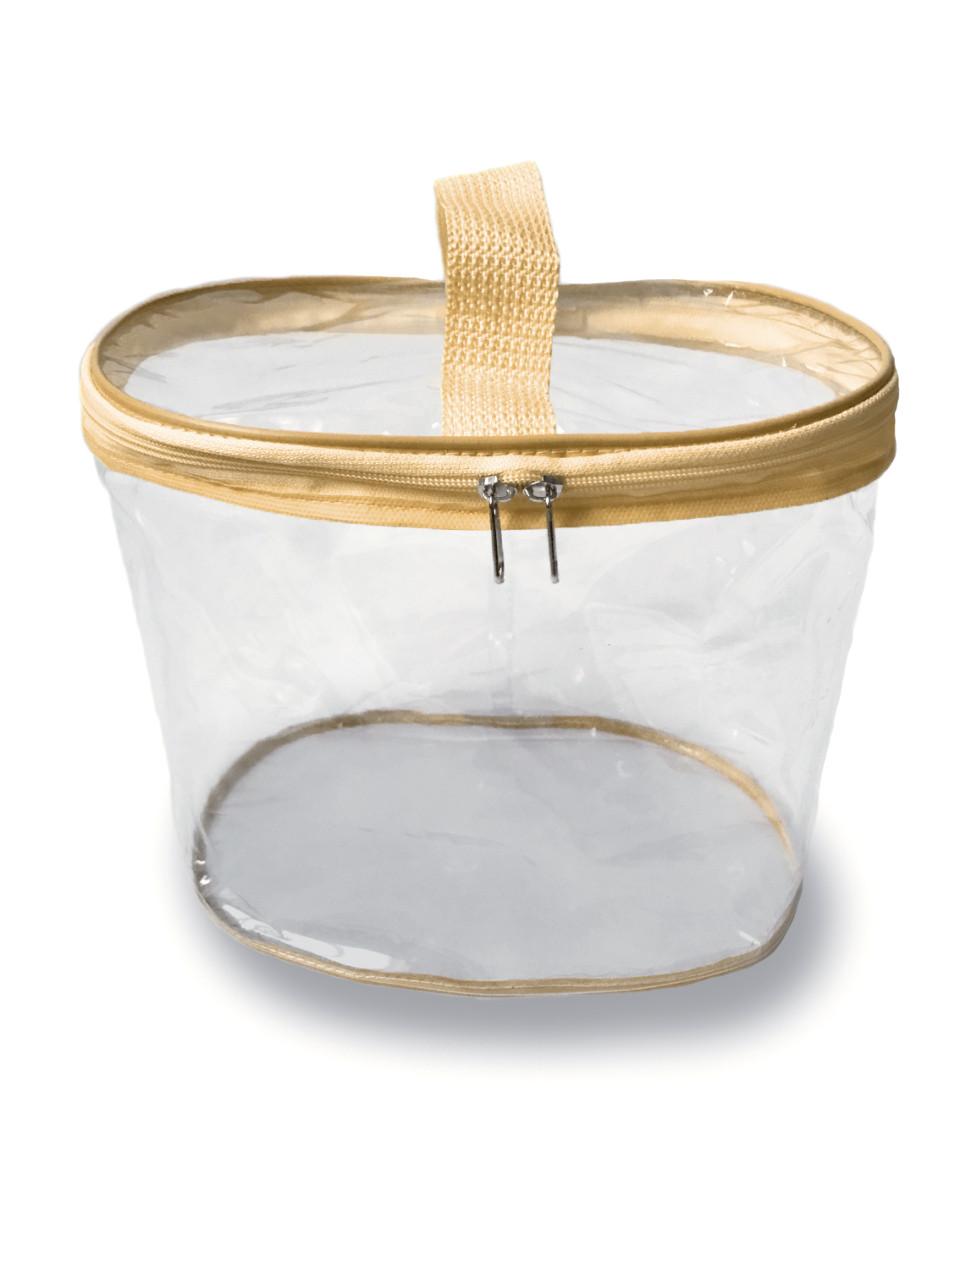 Косметичка Органайзер Mommy Bag- 24,5*22,5*16см - Бежевый